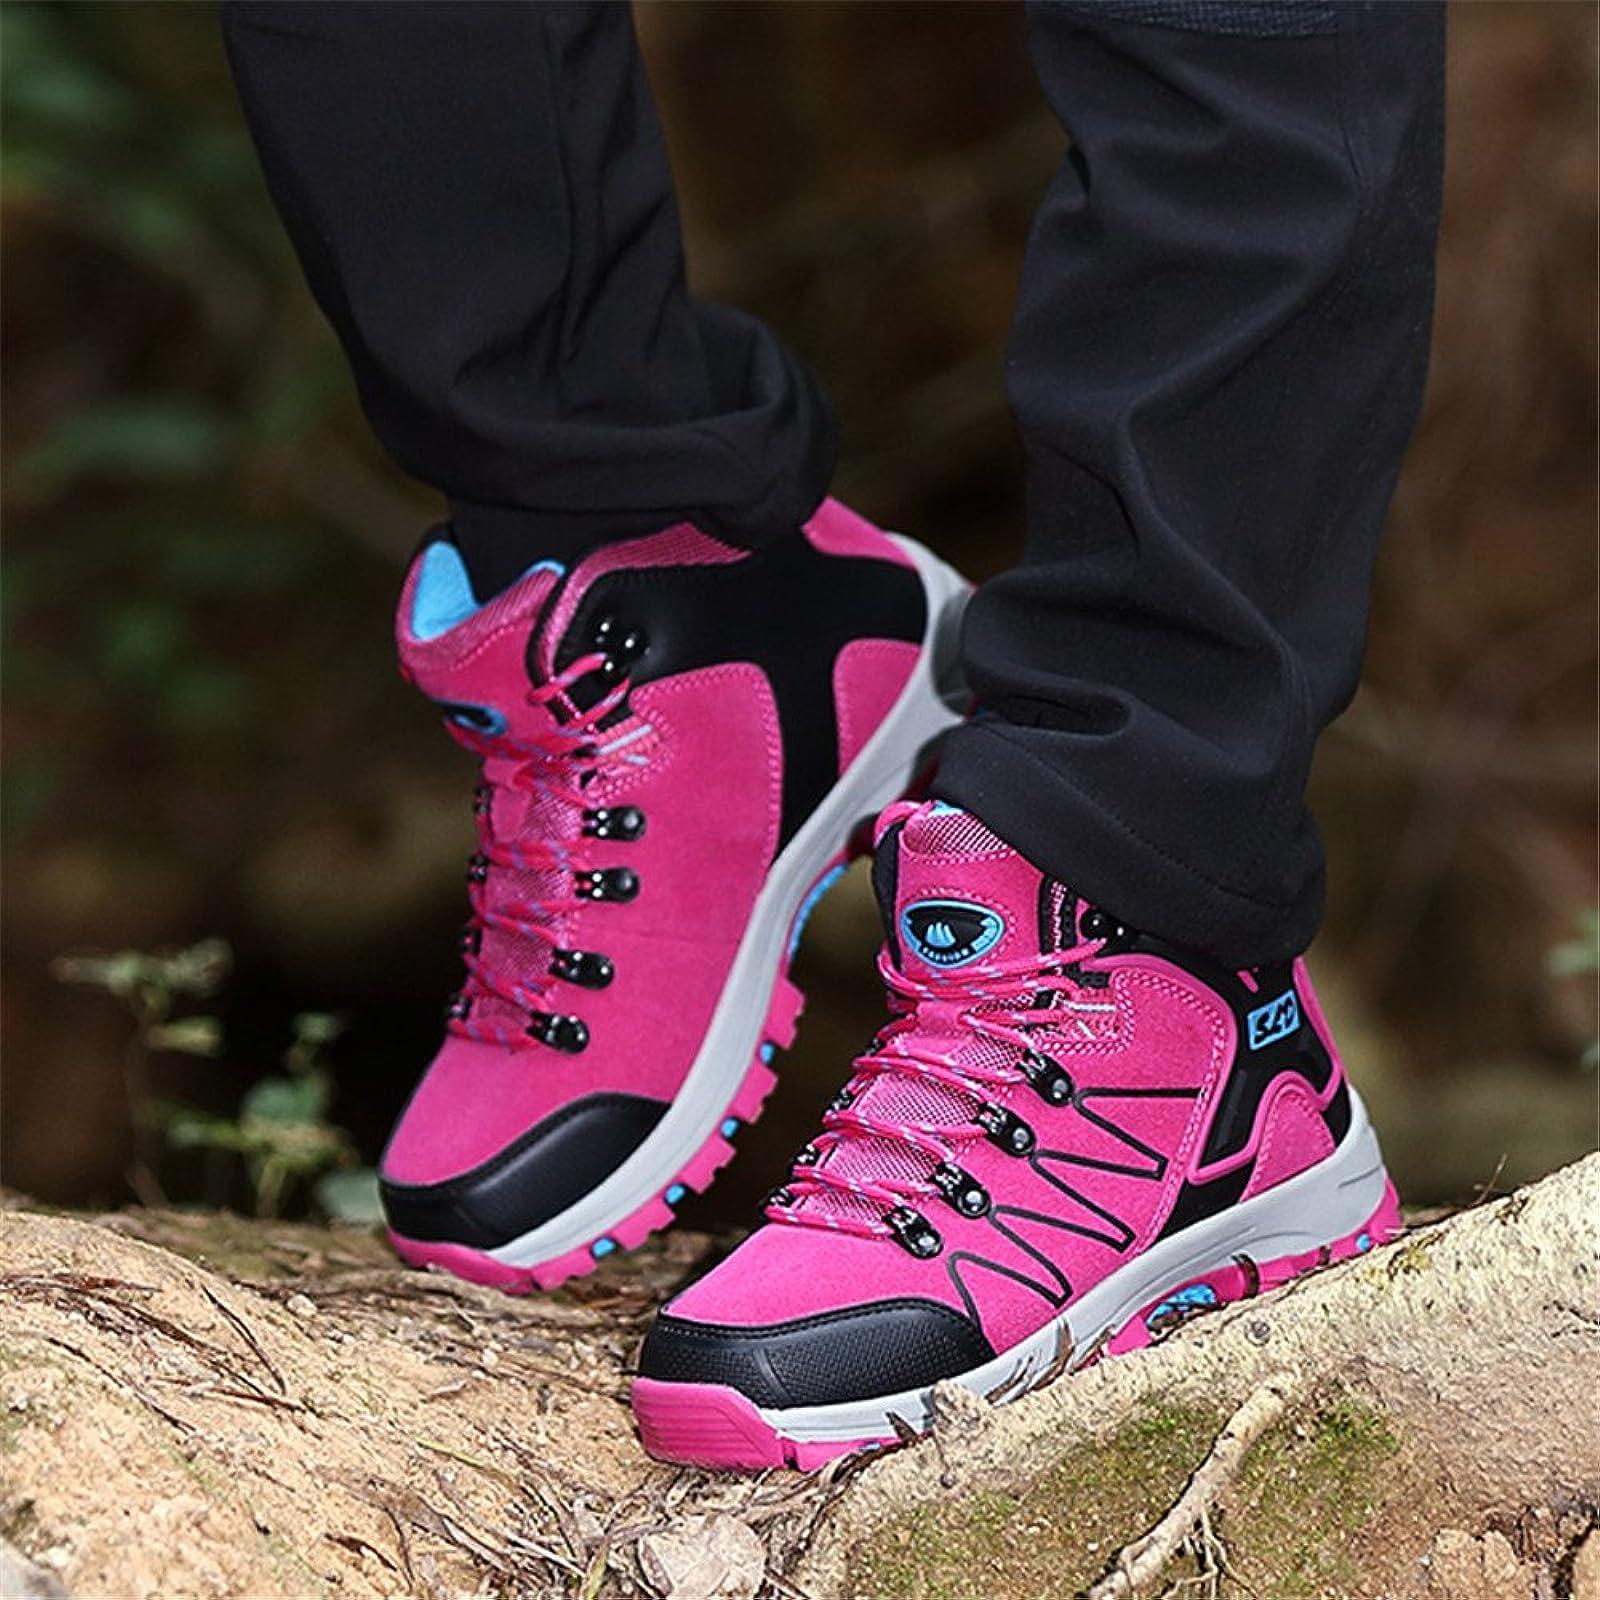 FEOZYZ Womens Hiking Boots Trekking Shoes Anti- QLMXZY's 1008 - 6